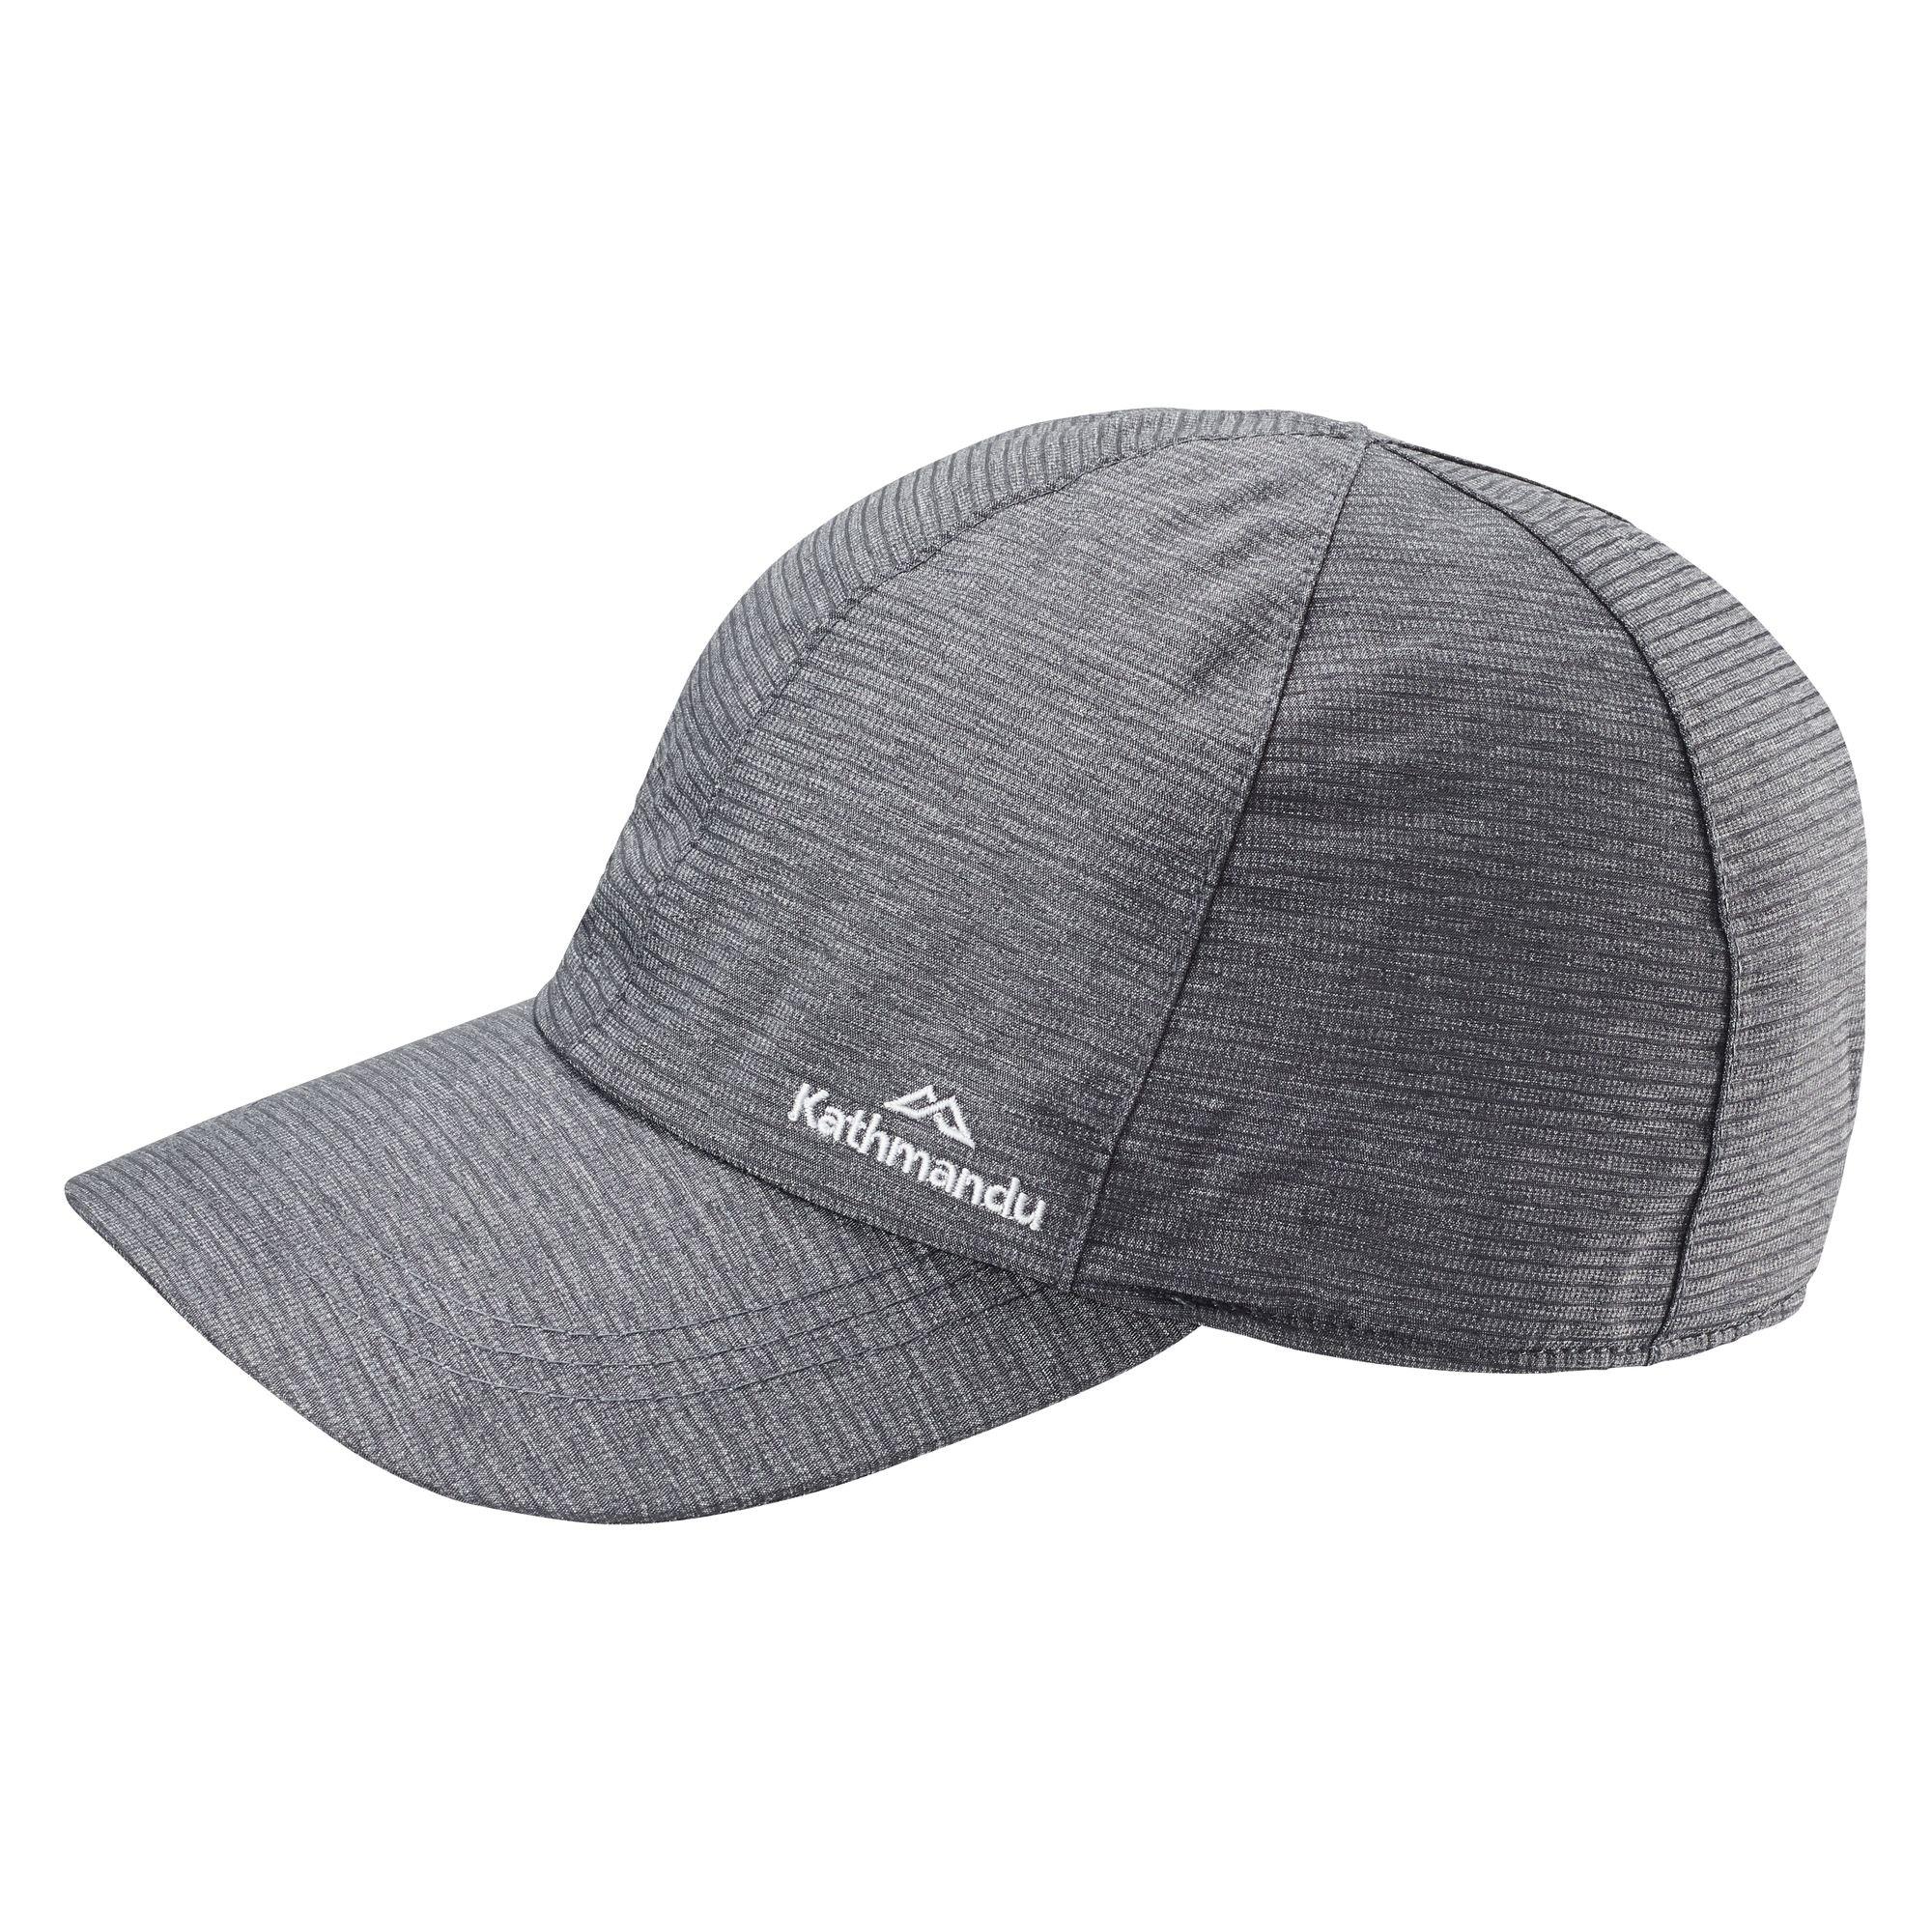 Lawrence Waterproof Cap